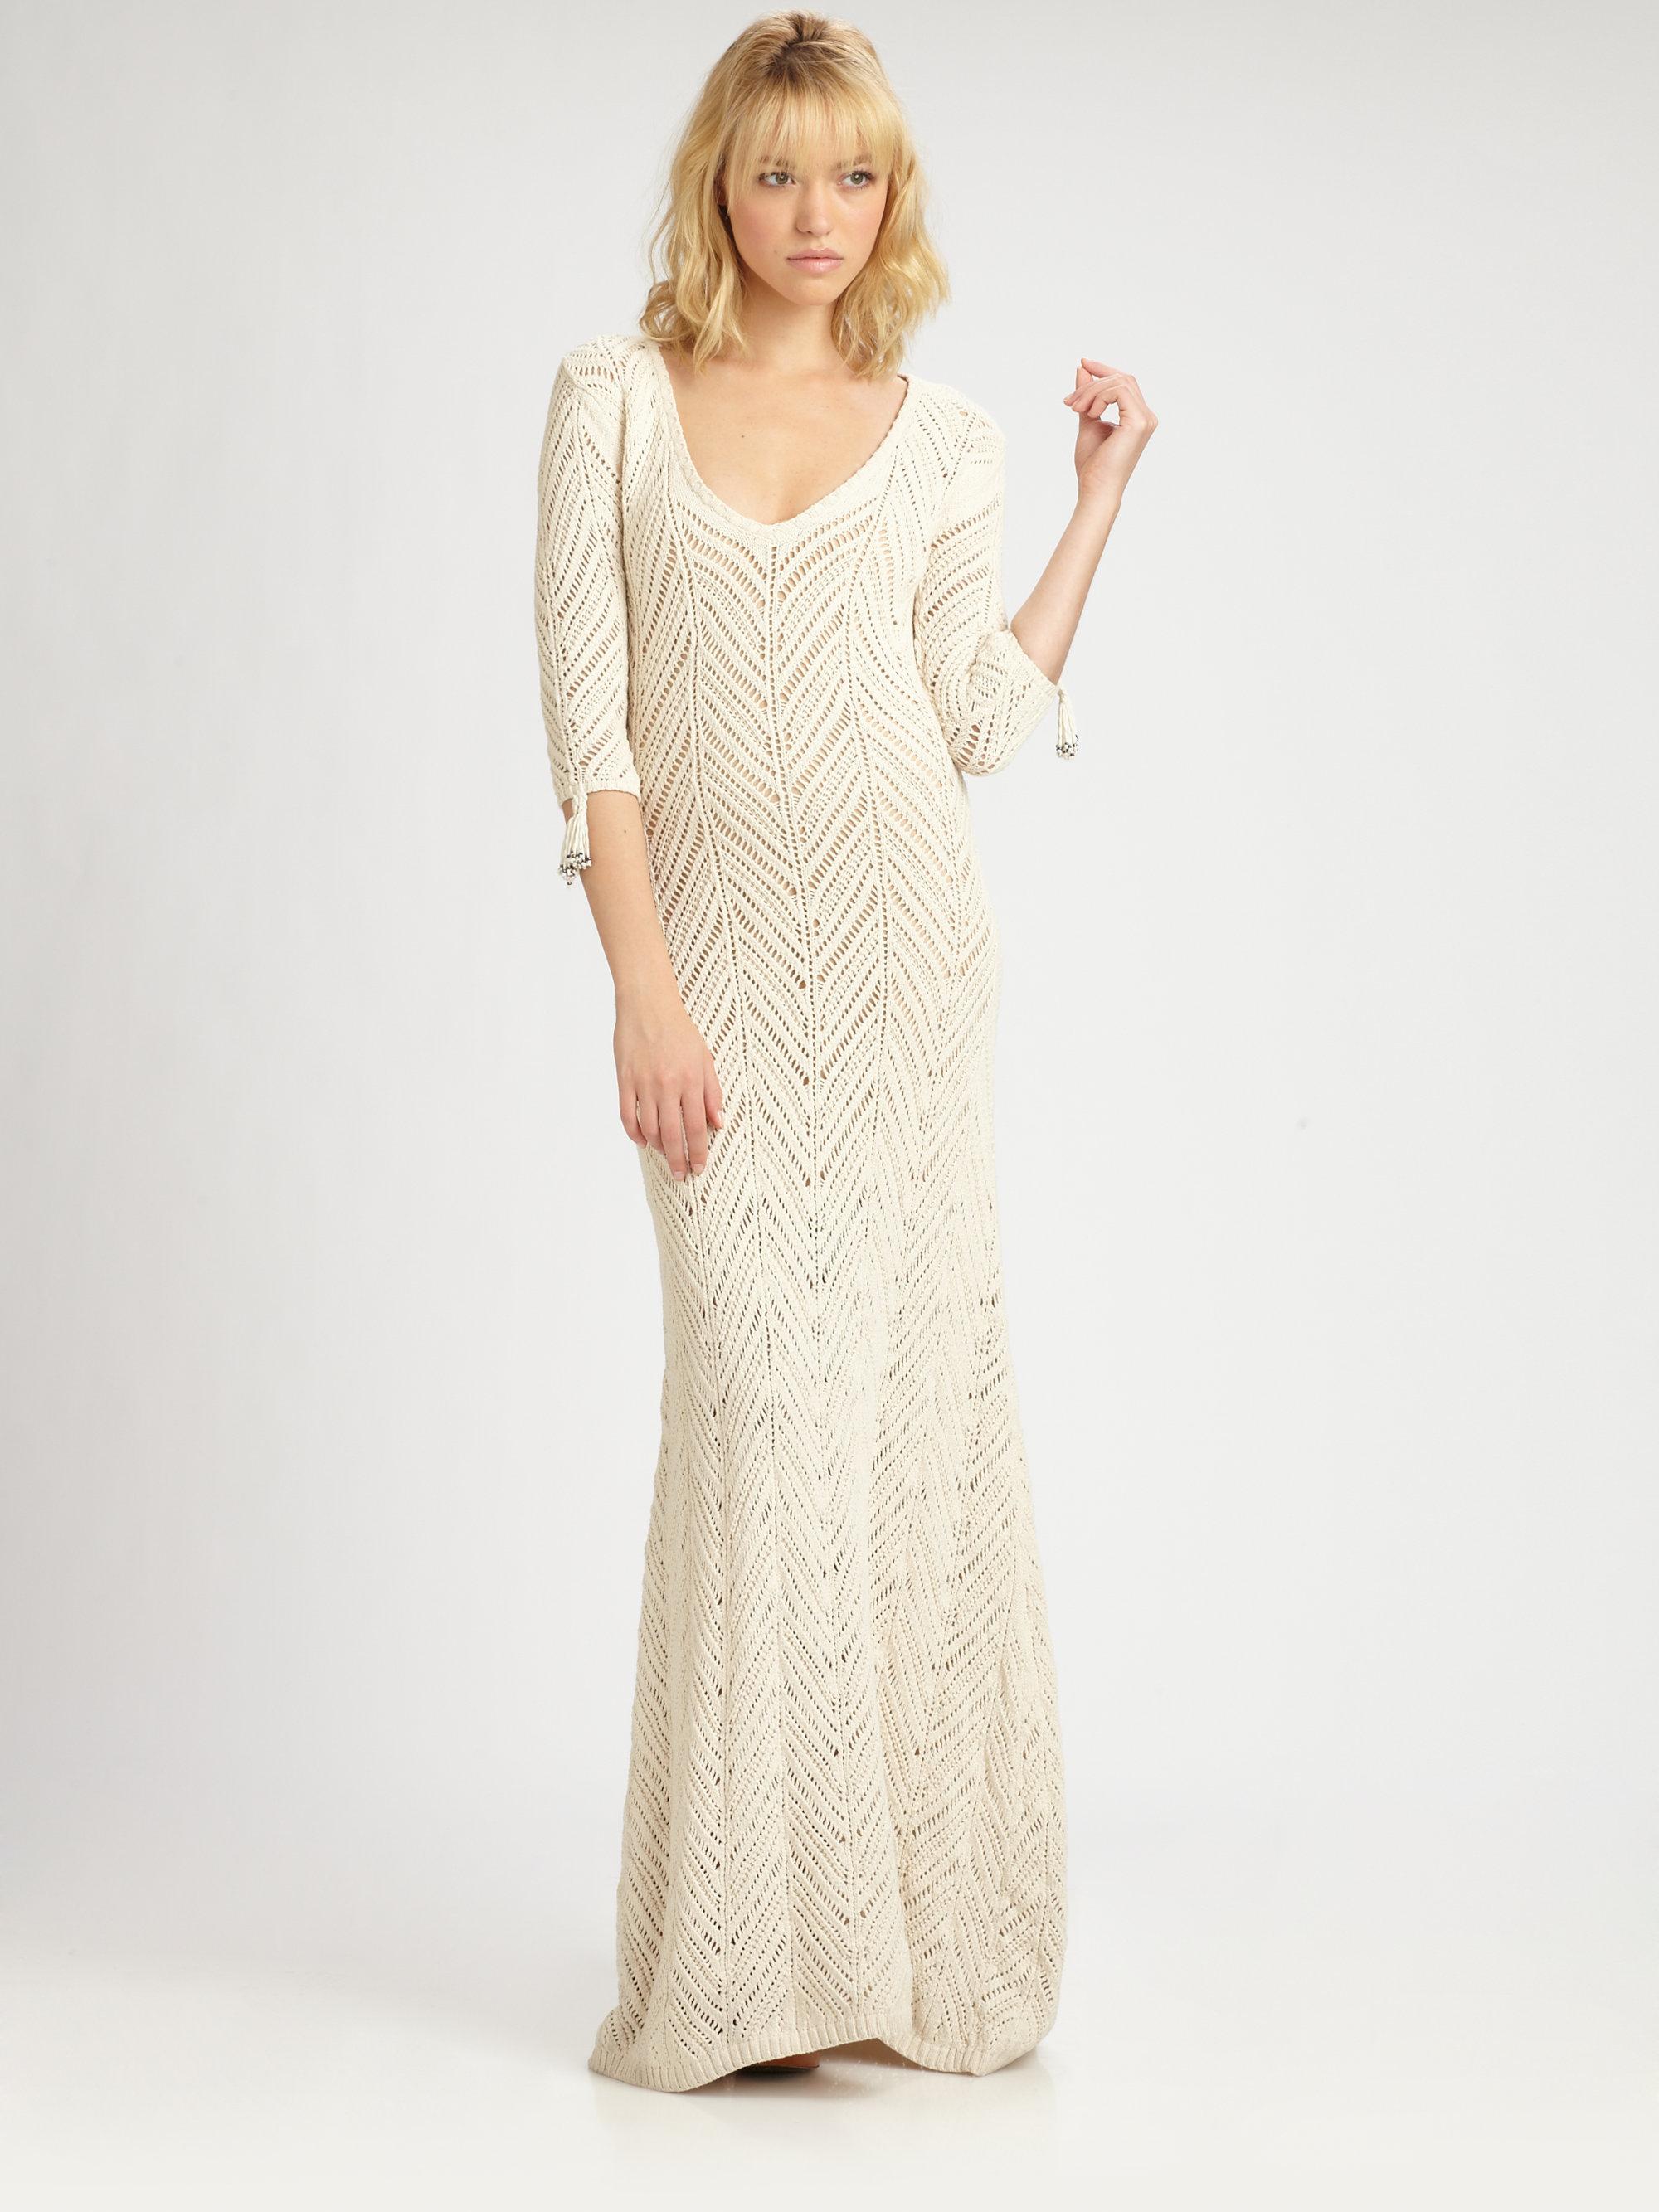 Lyst Mara Hoffman Crochet Maxi Dress In White